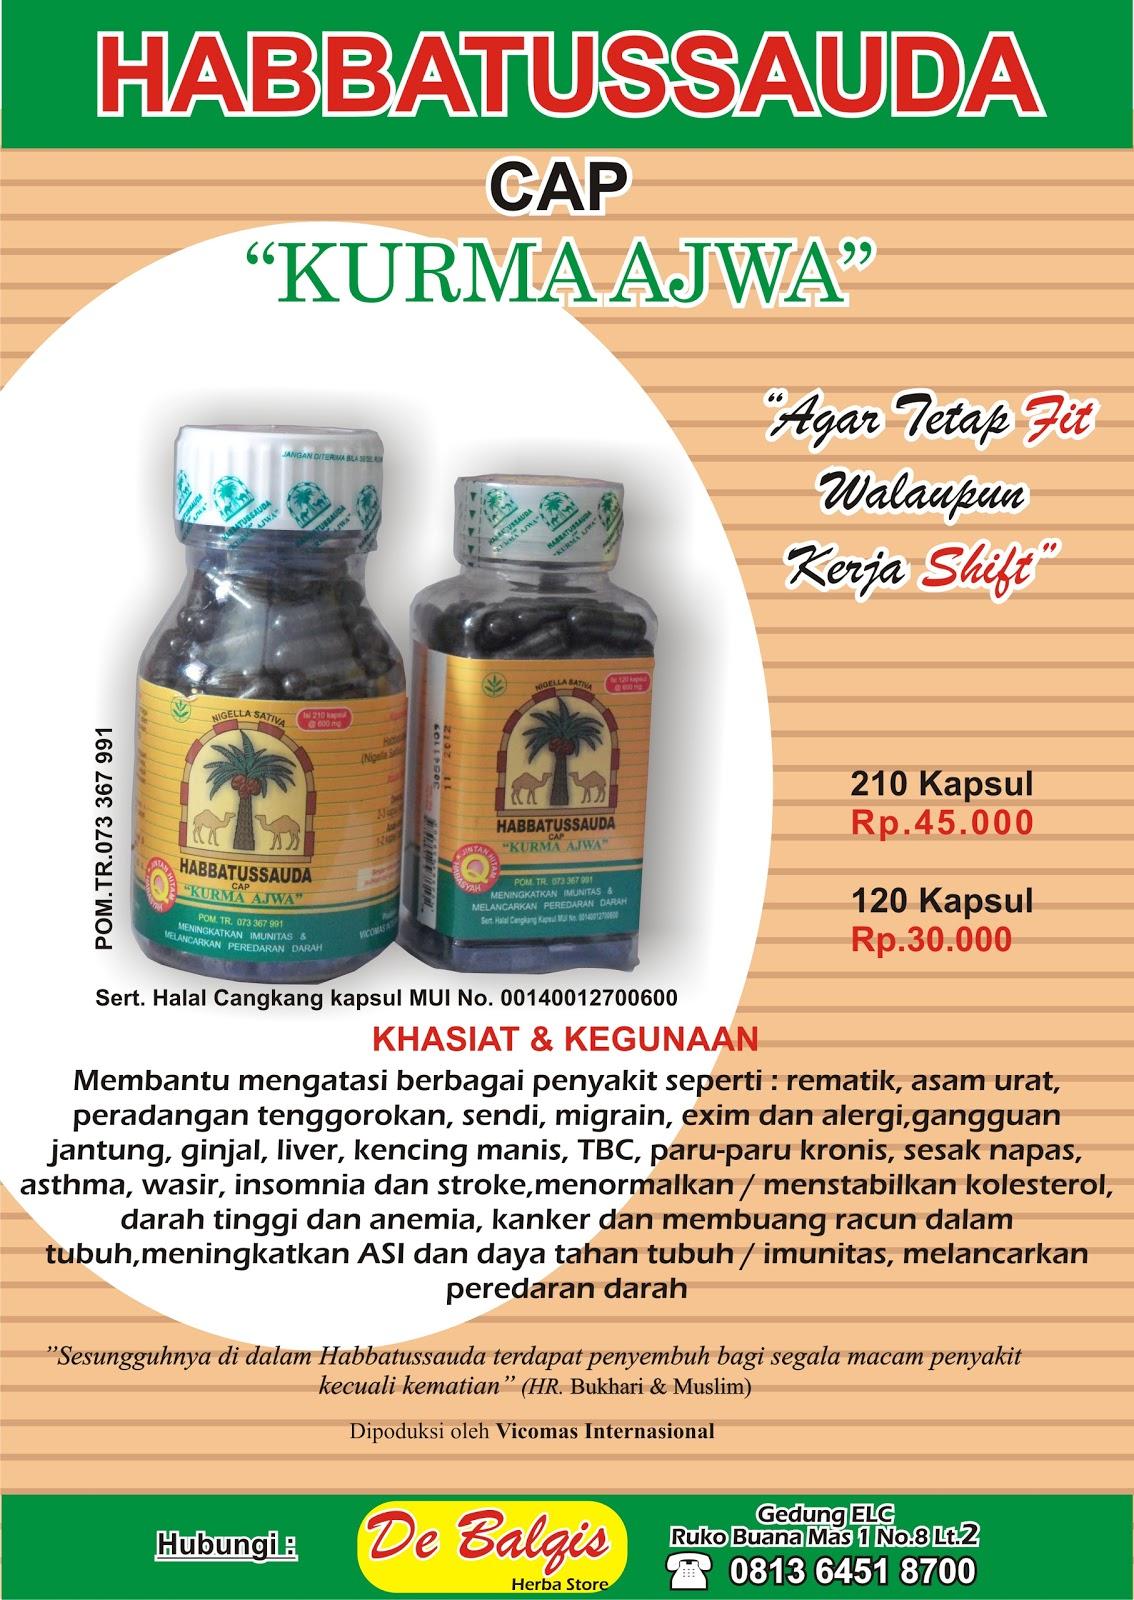 Jual Habbatussauda Ajwa 120 Kapsul Cap Kurma Debalqis Herba Store